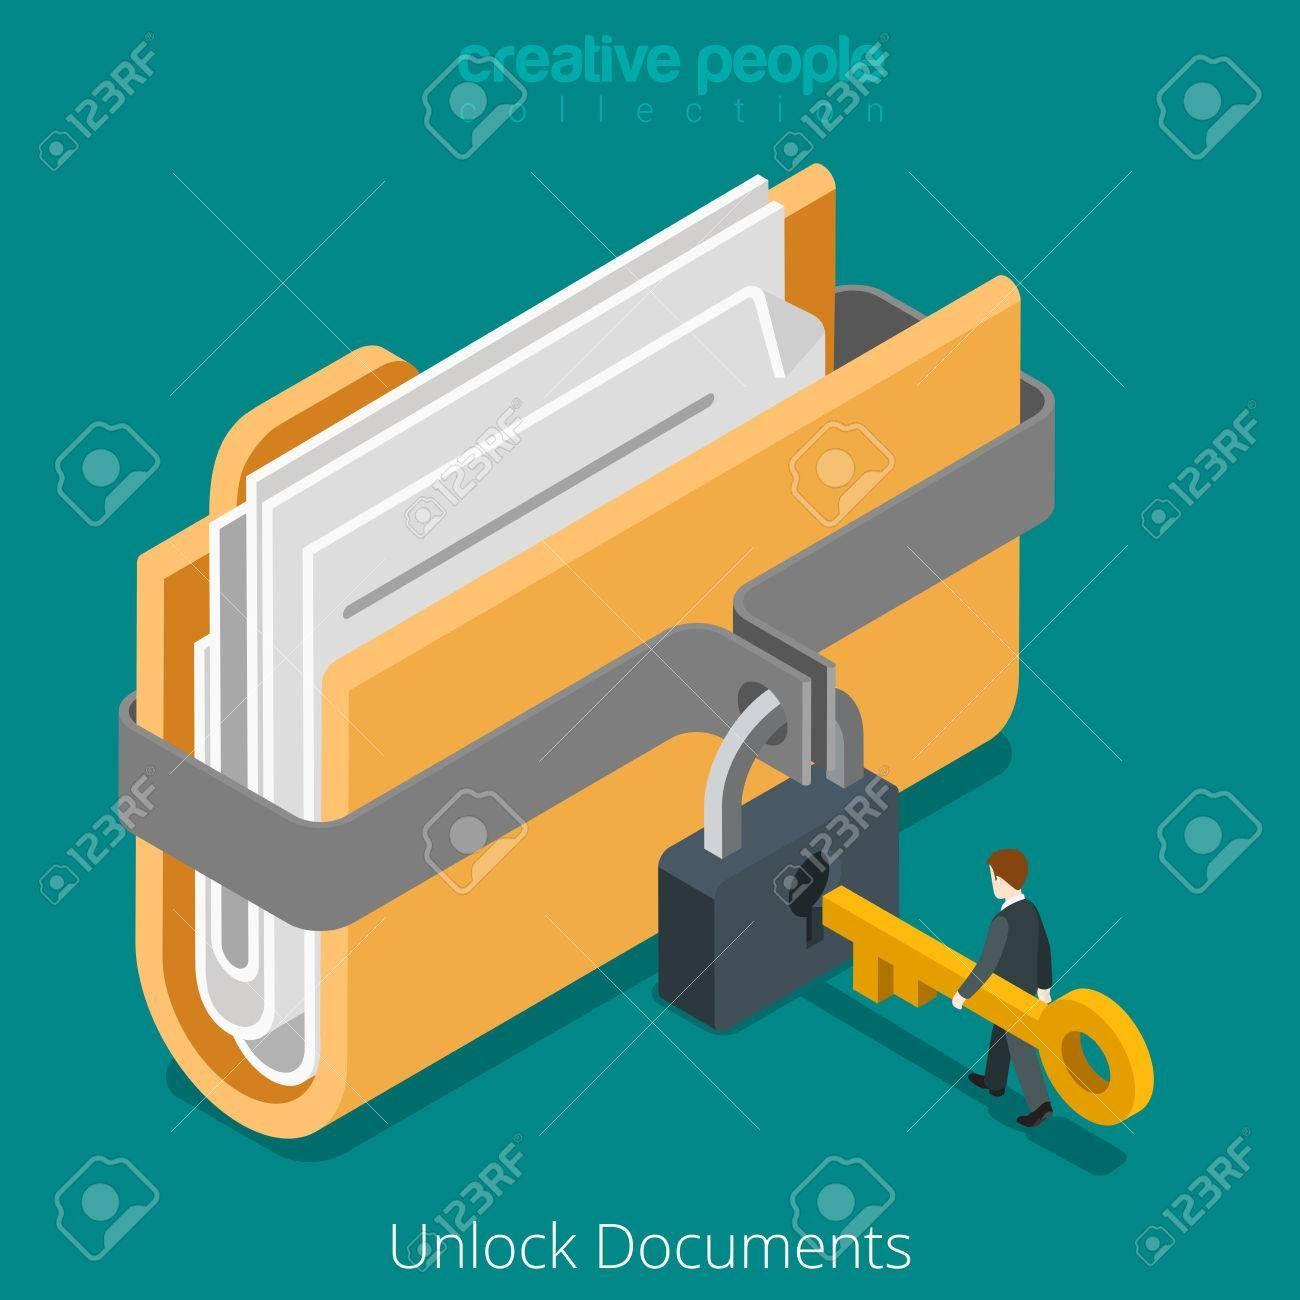 Unlock Folder Secure Data File Document With Lock Key Icon Flat Key Icon Isometric Design Unlock